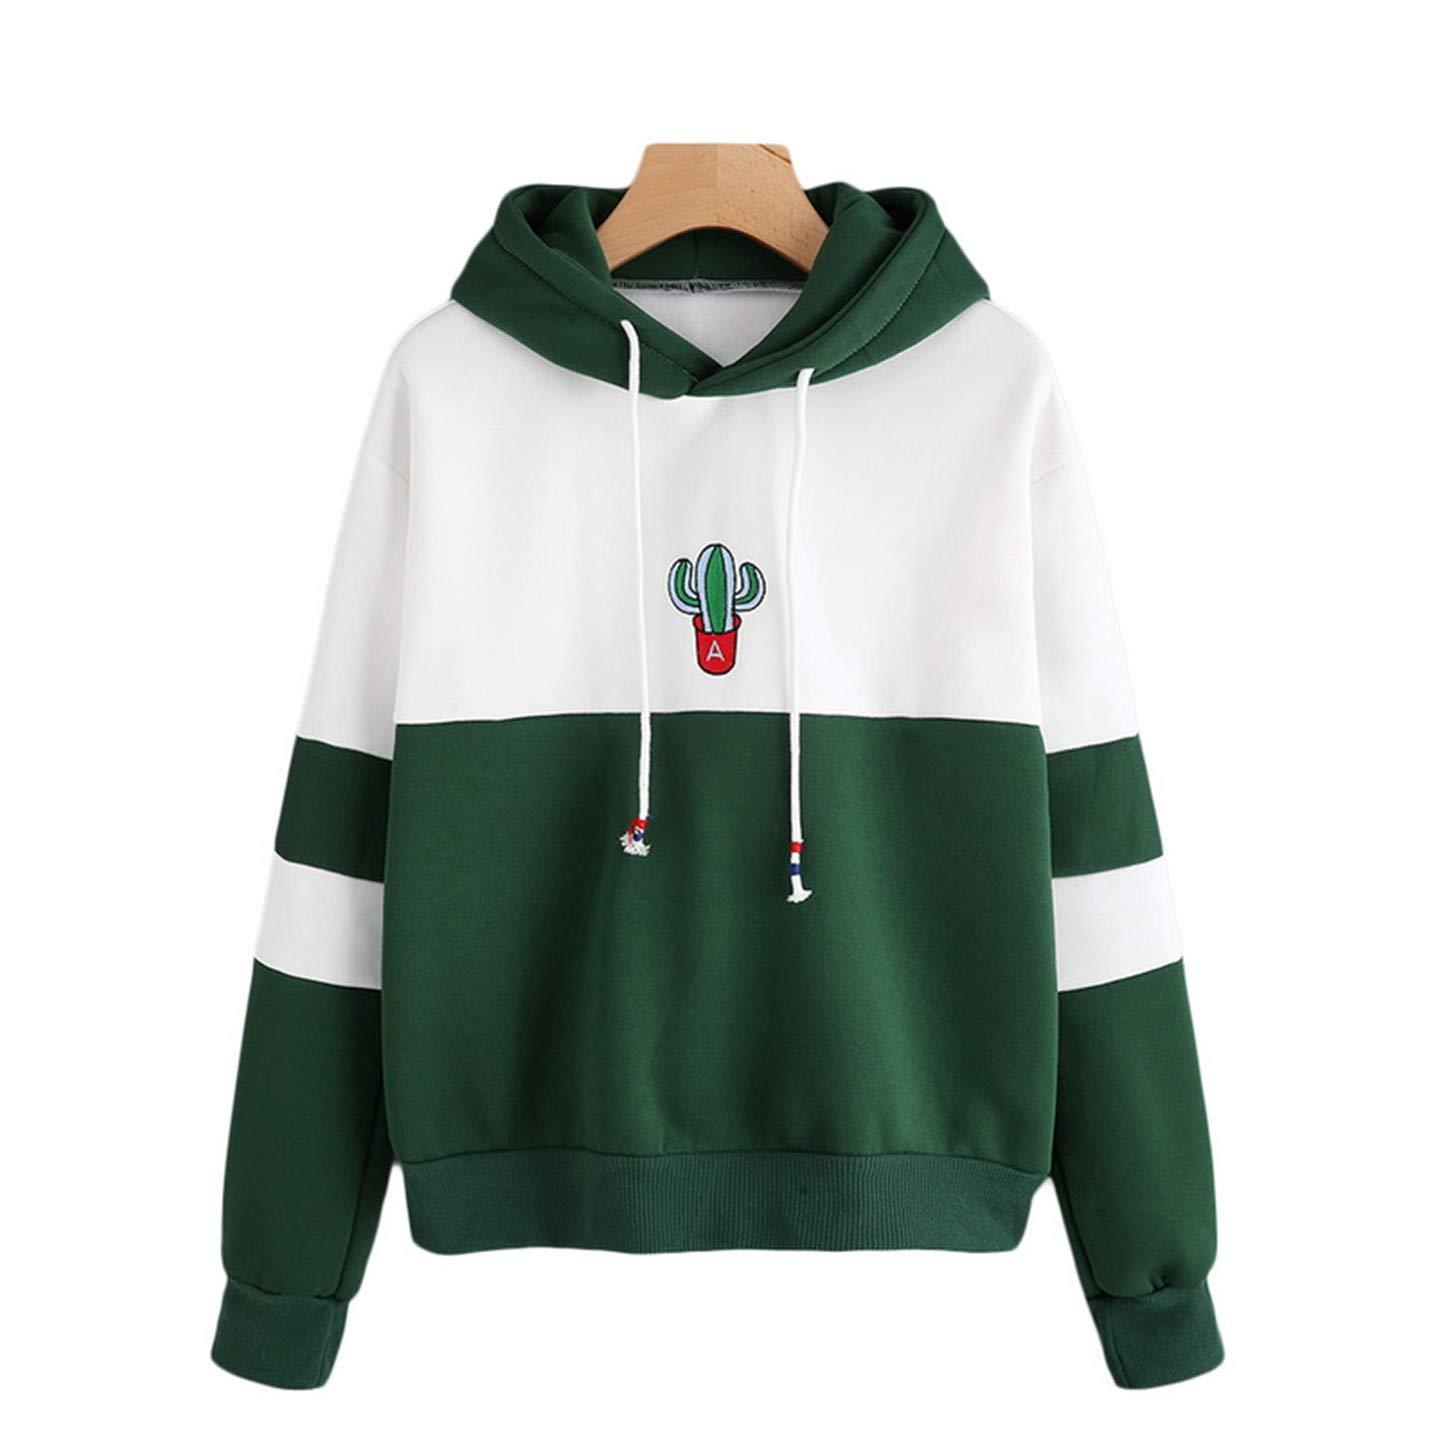 Amazon.com: Yakke Pullovers Sweatshirts Female Hoodie Pink & Gray Plus Size Sweatshirt Hoodies Women Long Sleeves Hoody for Wome: Clothing